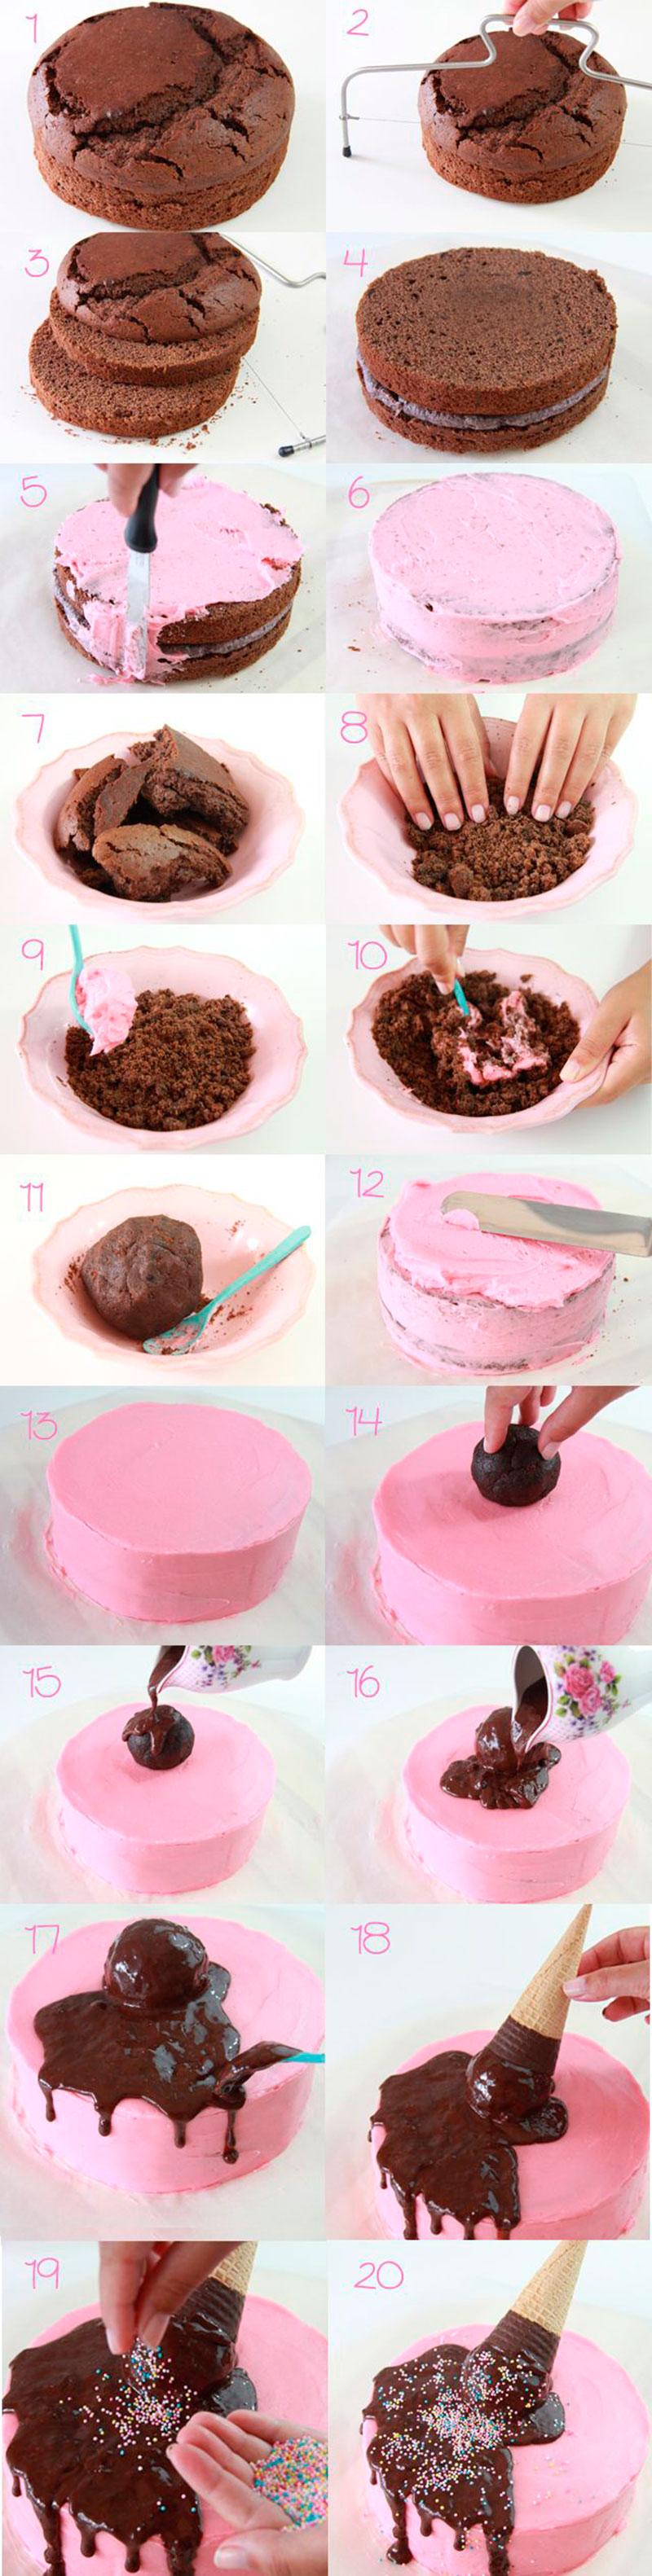 Montar bolo infantil 7